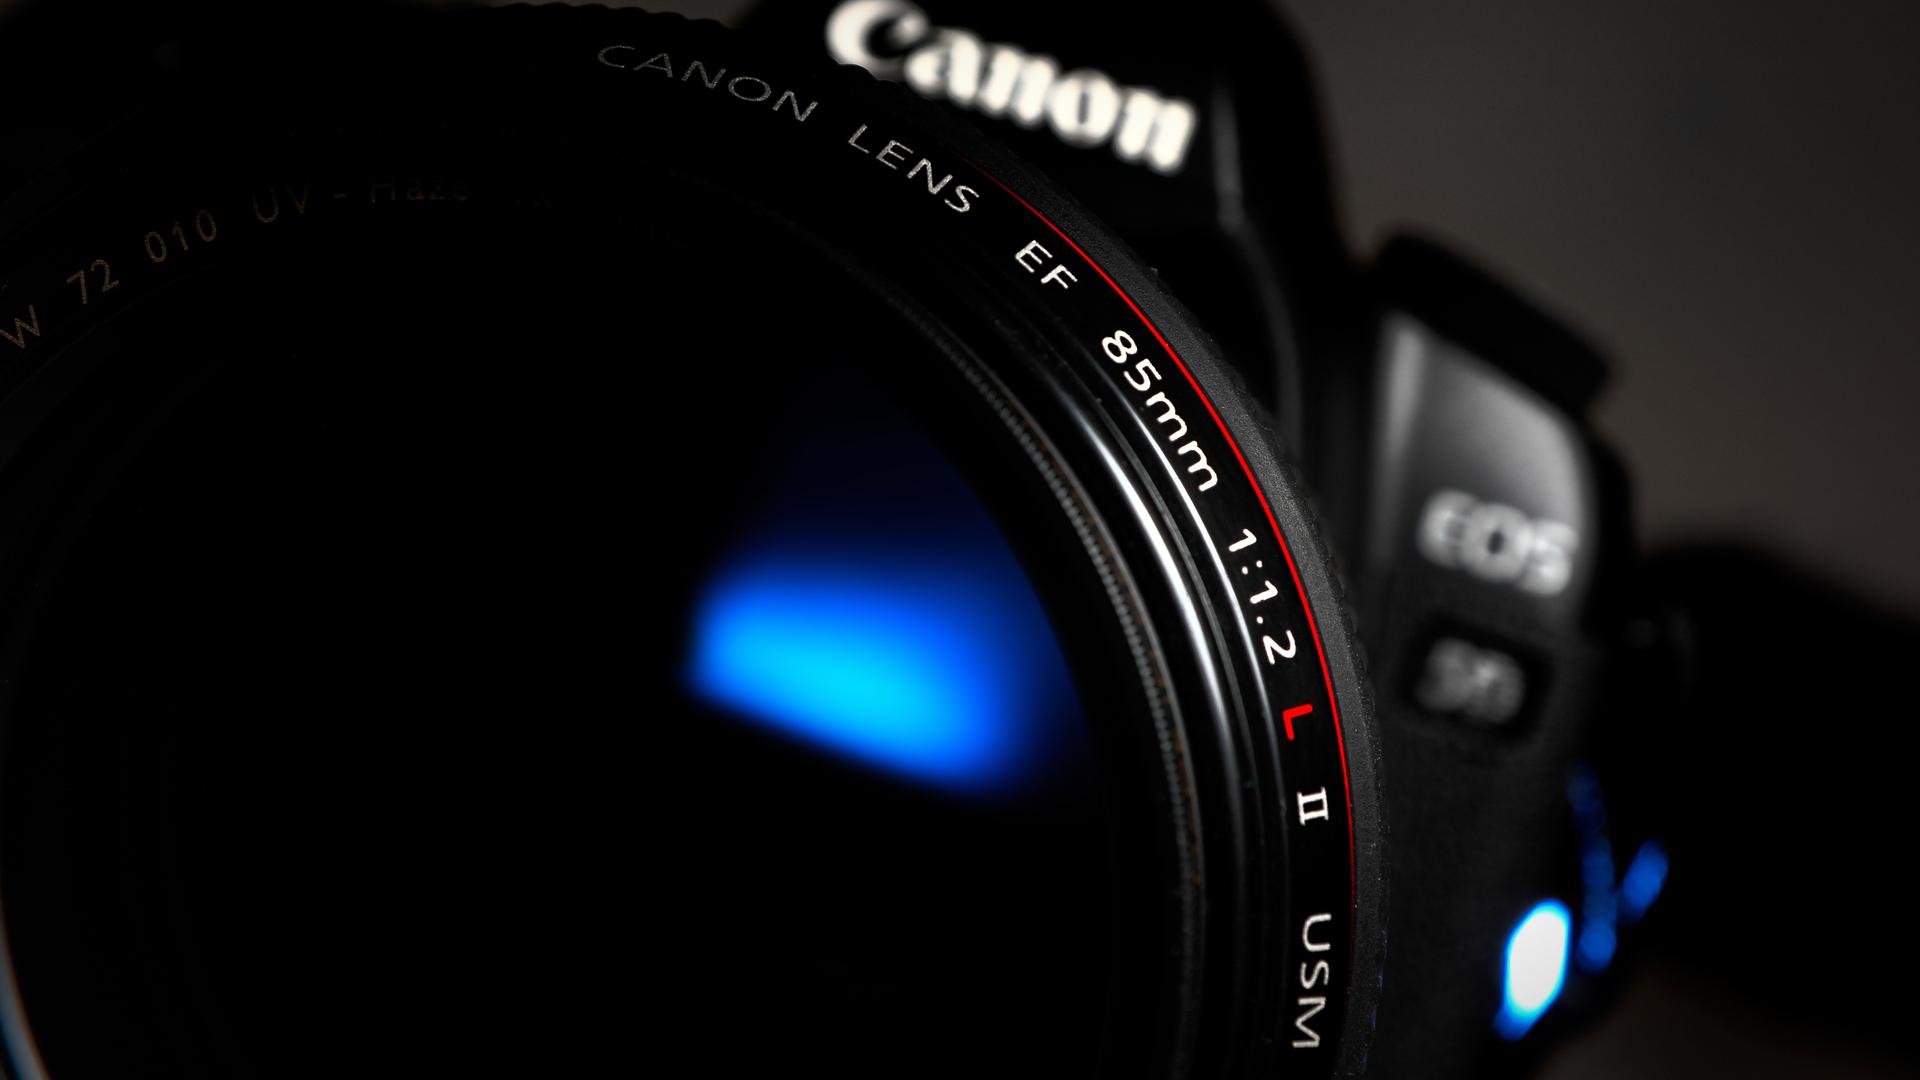 Canon Camera Wallpaper Wallpapersafari